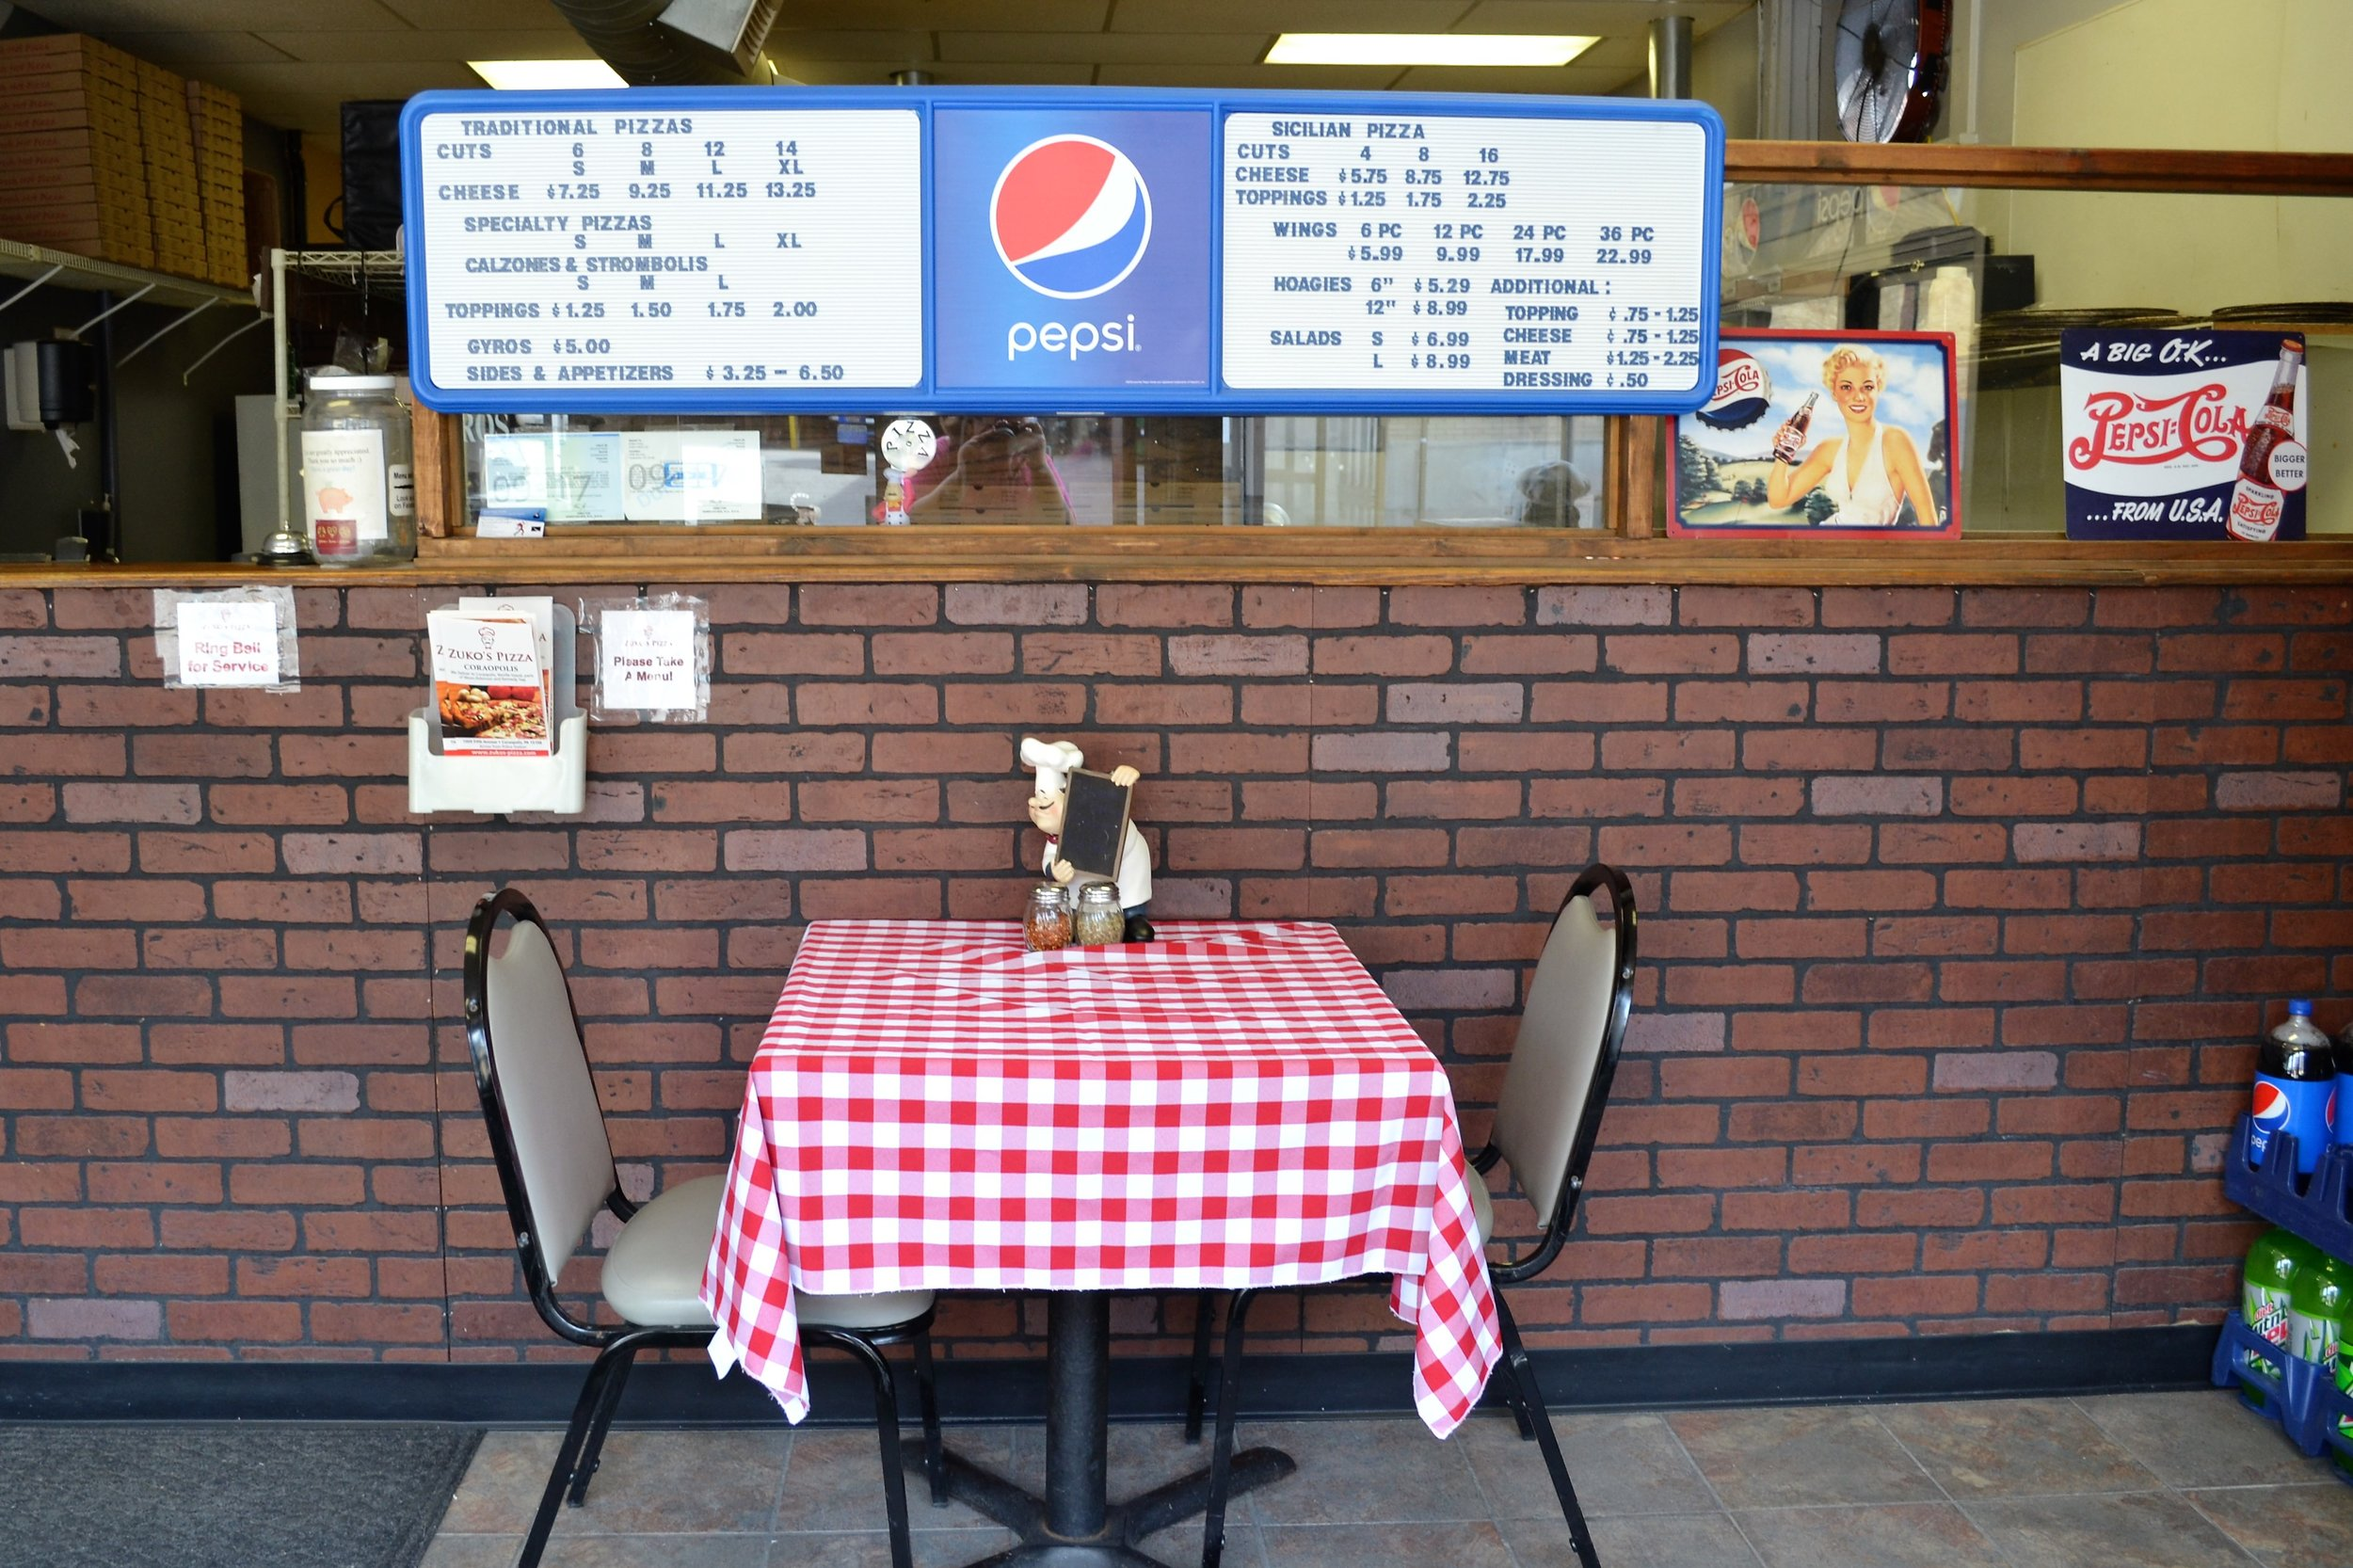 Zuko's Pizza & Wings - 1009 5th Ave, (412) 262-2299